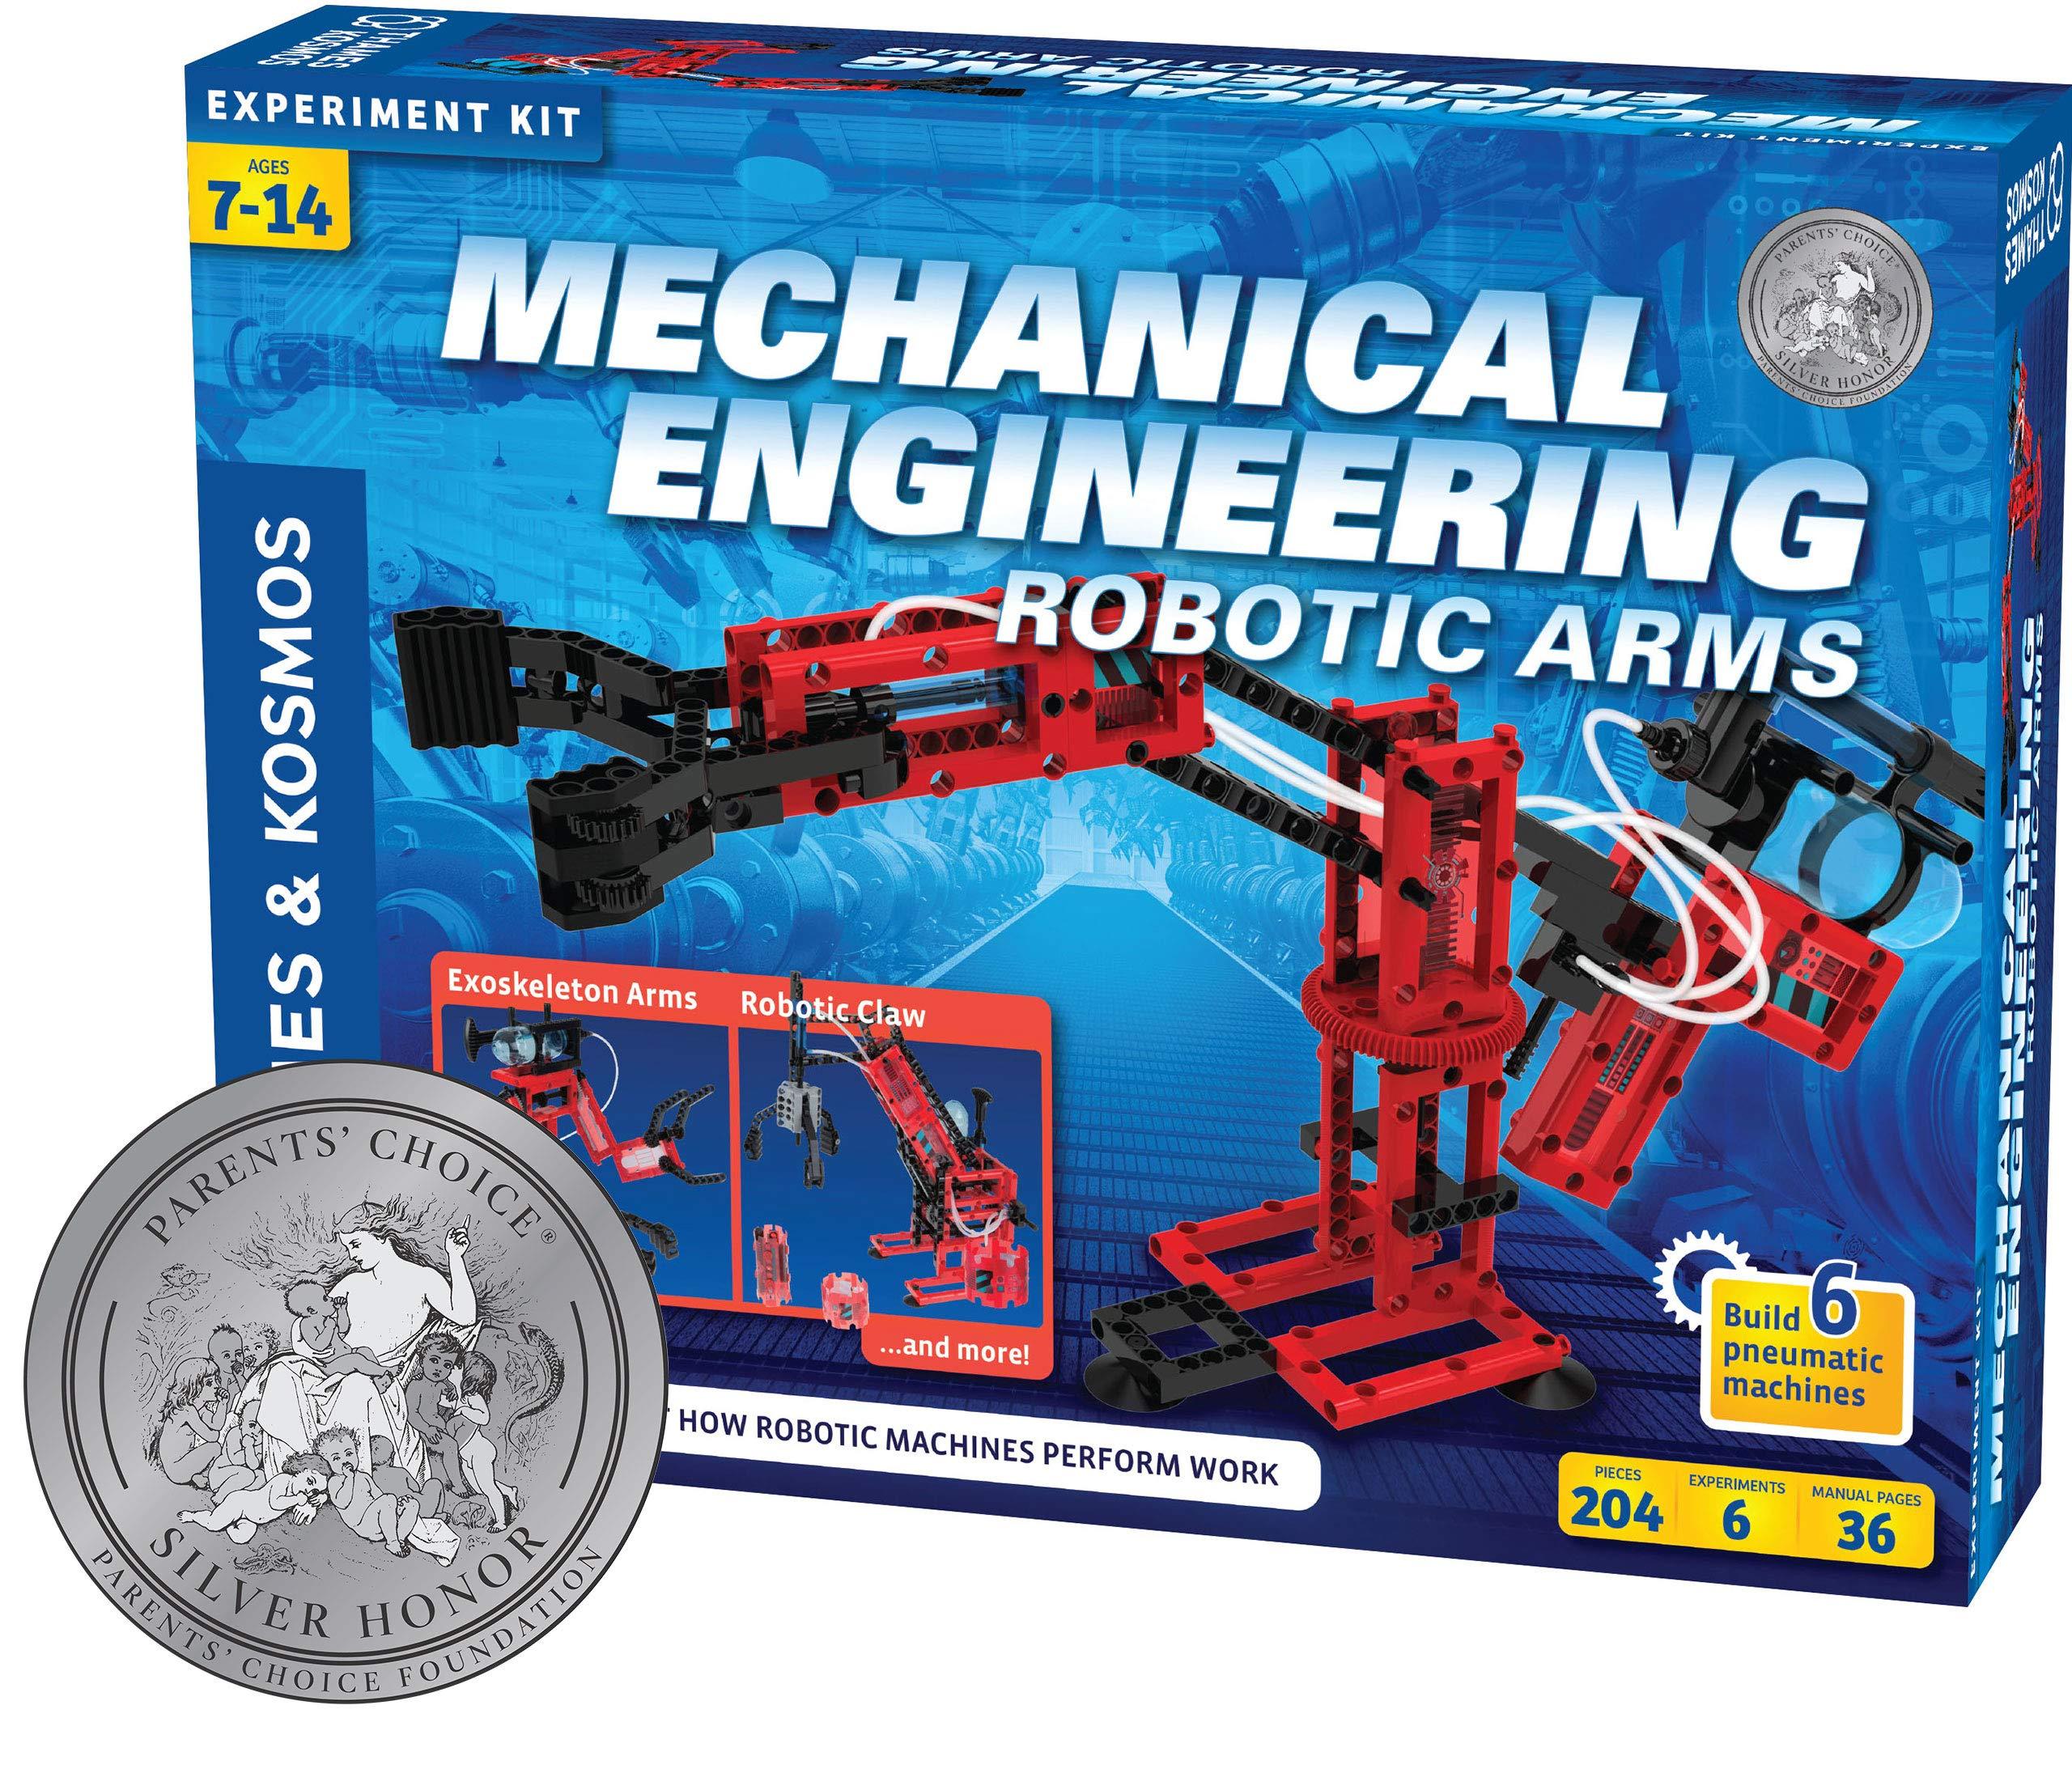 Thames & Kosmos Mechanical Engineering Robotic Arms by Thames & Kosmos